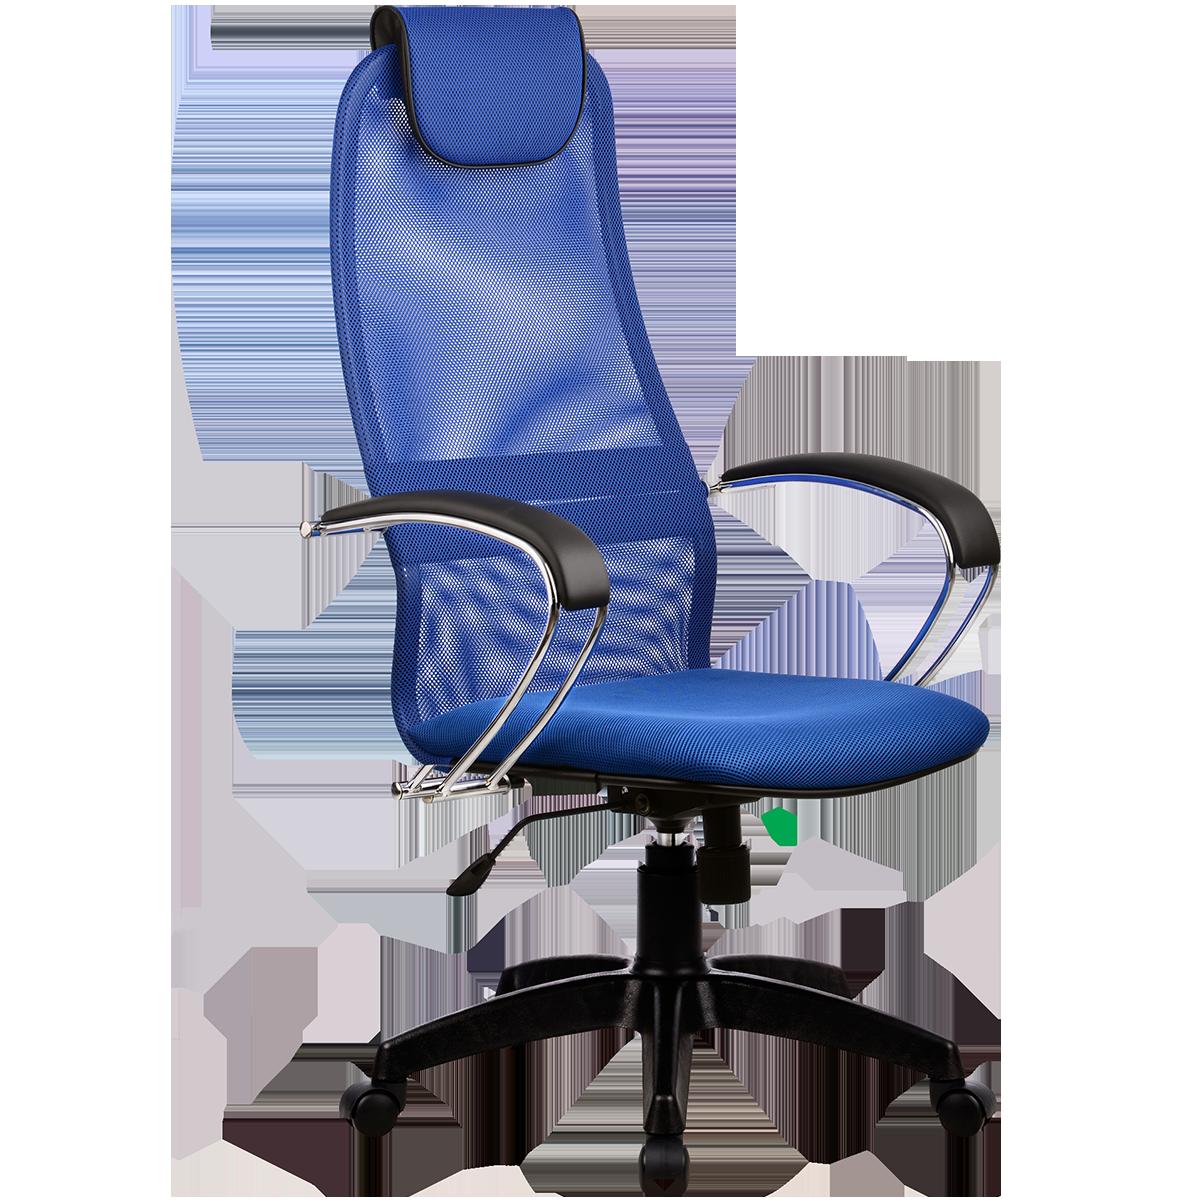 Кресло офисное Metta BK-8 PL 23 синий